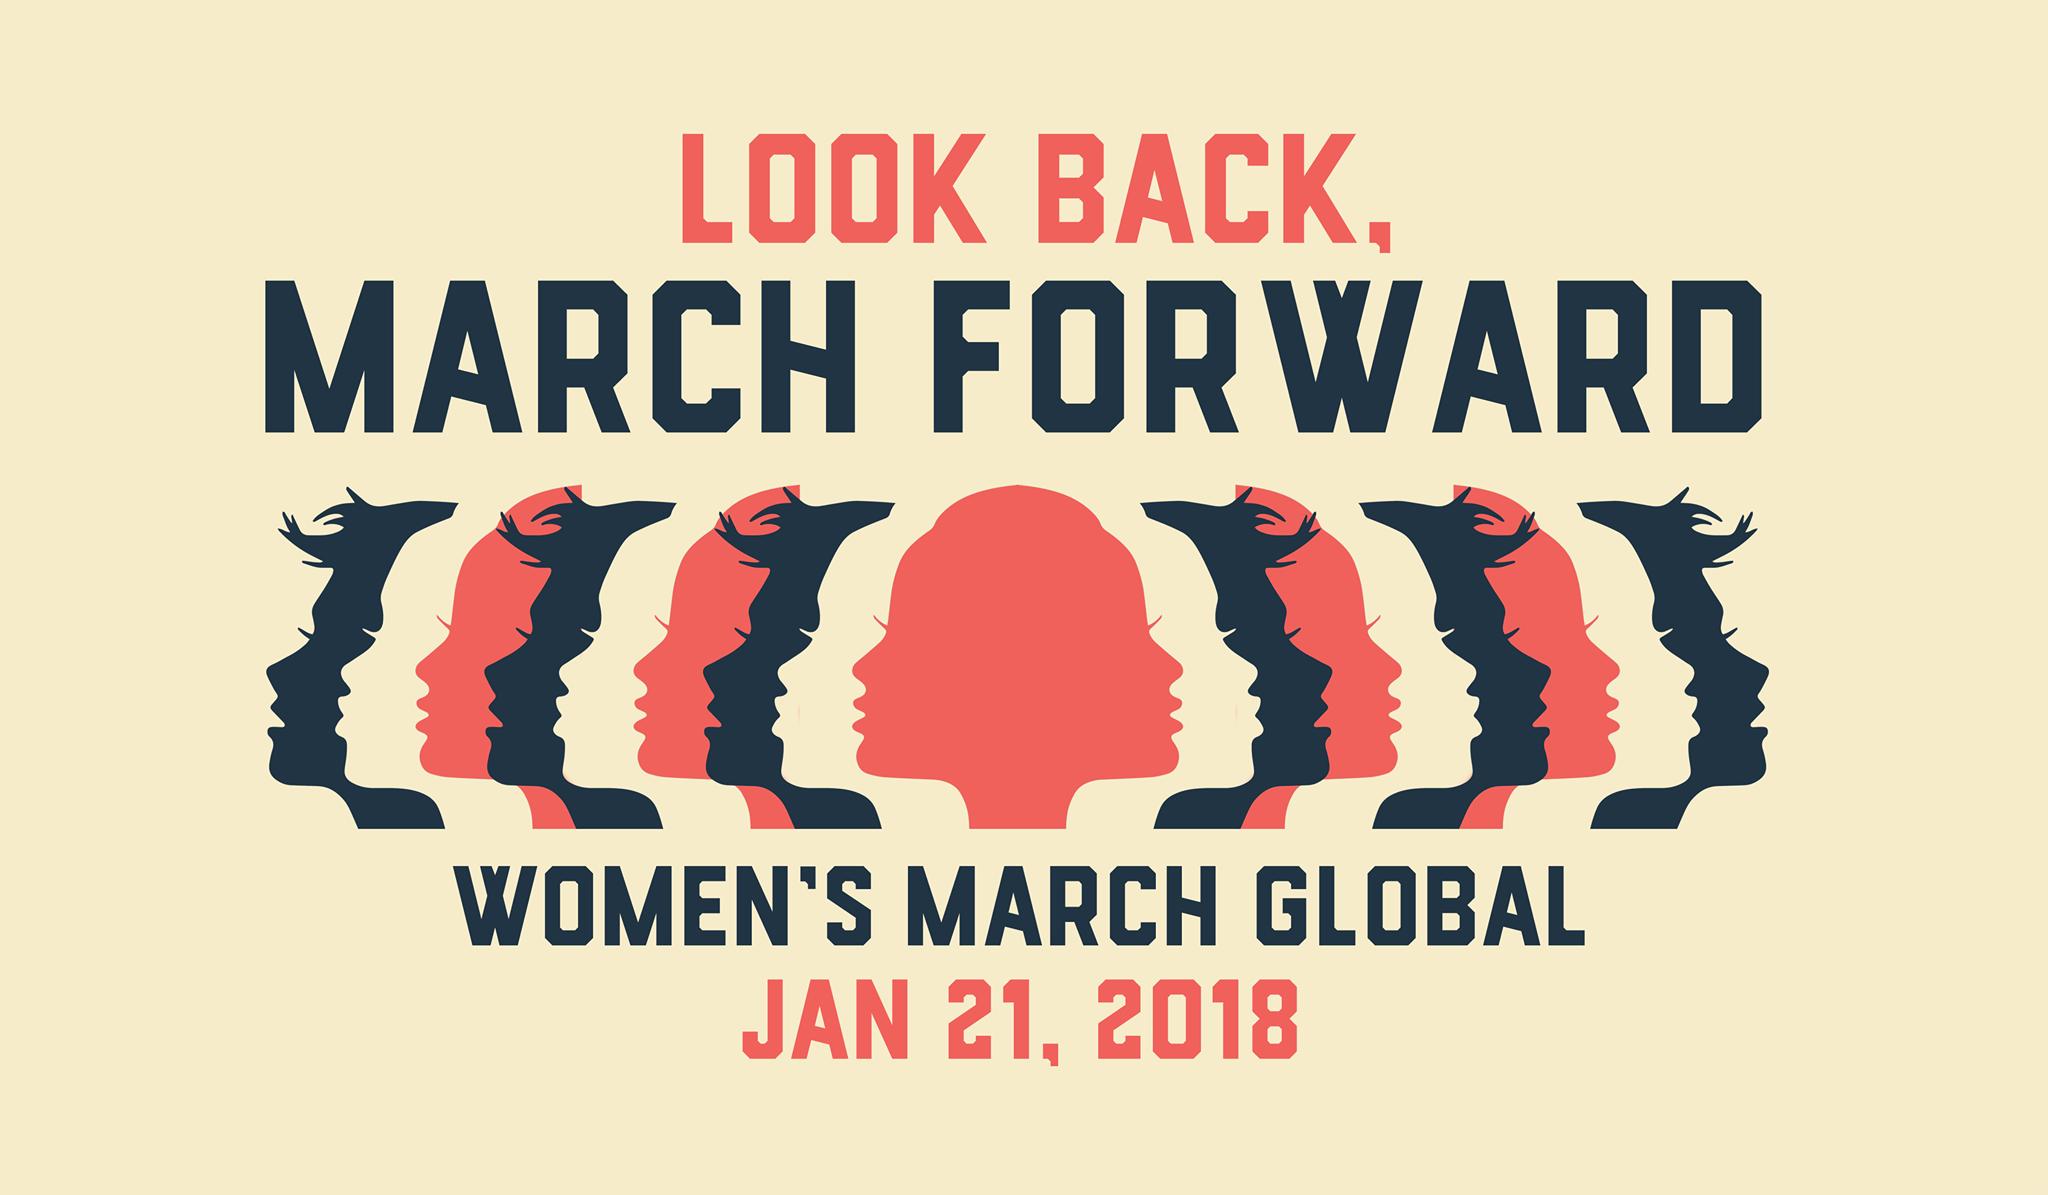 wm_look_back_march_foward.png